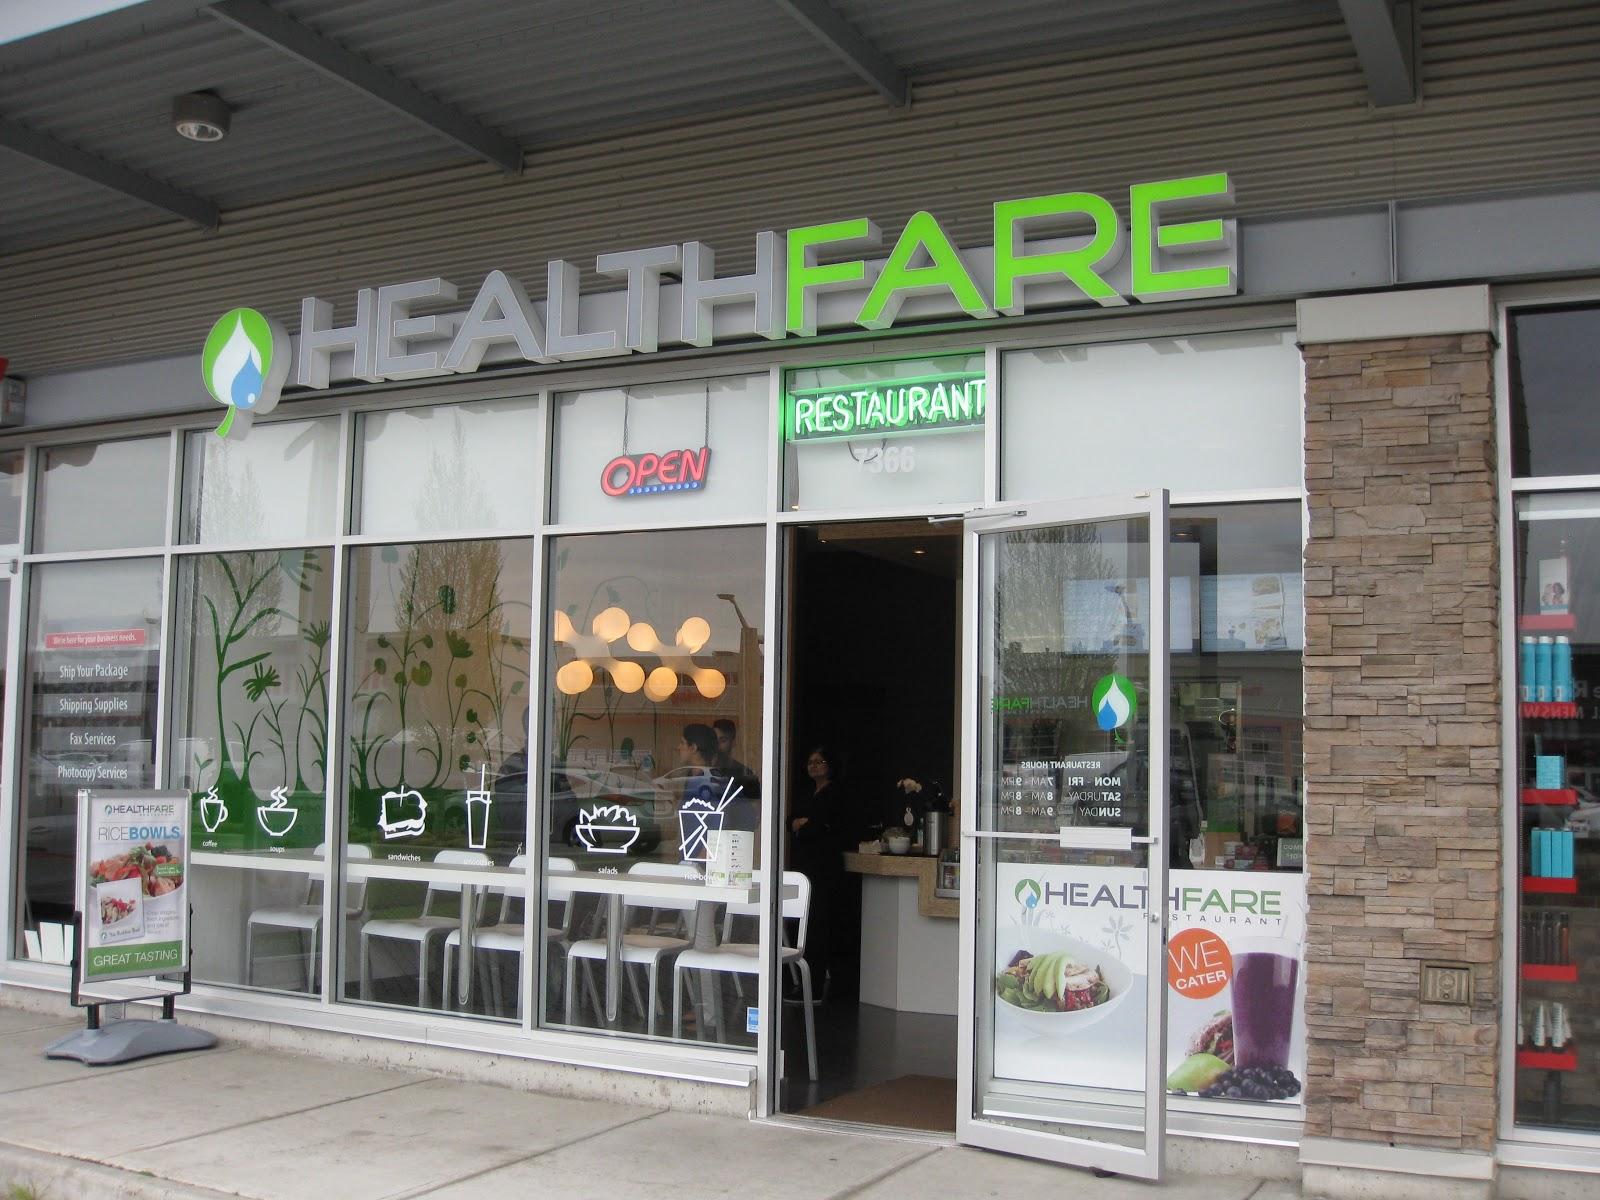 Healthfare Restaurant Menu